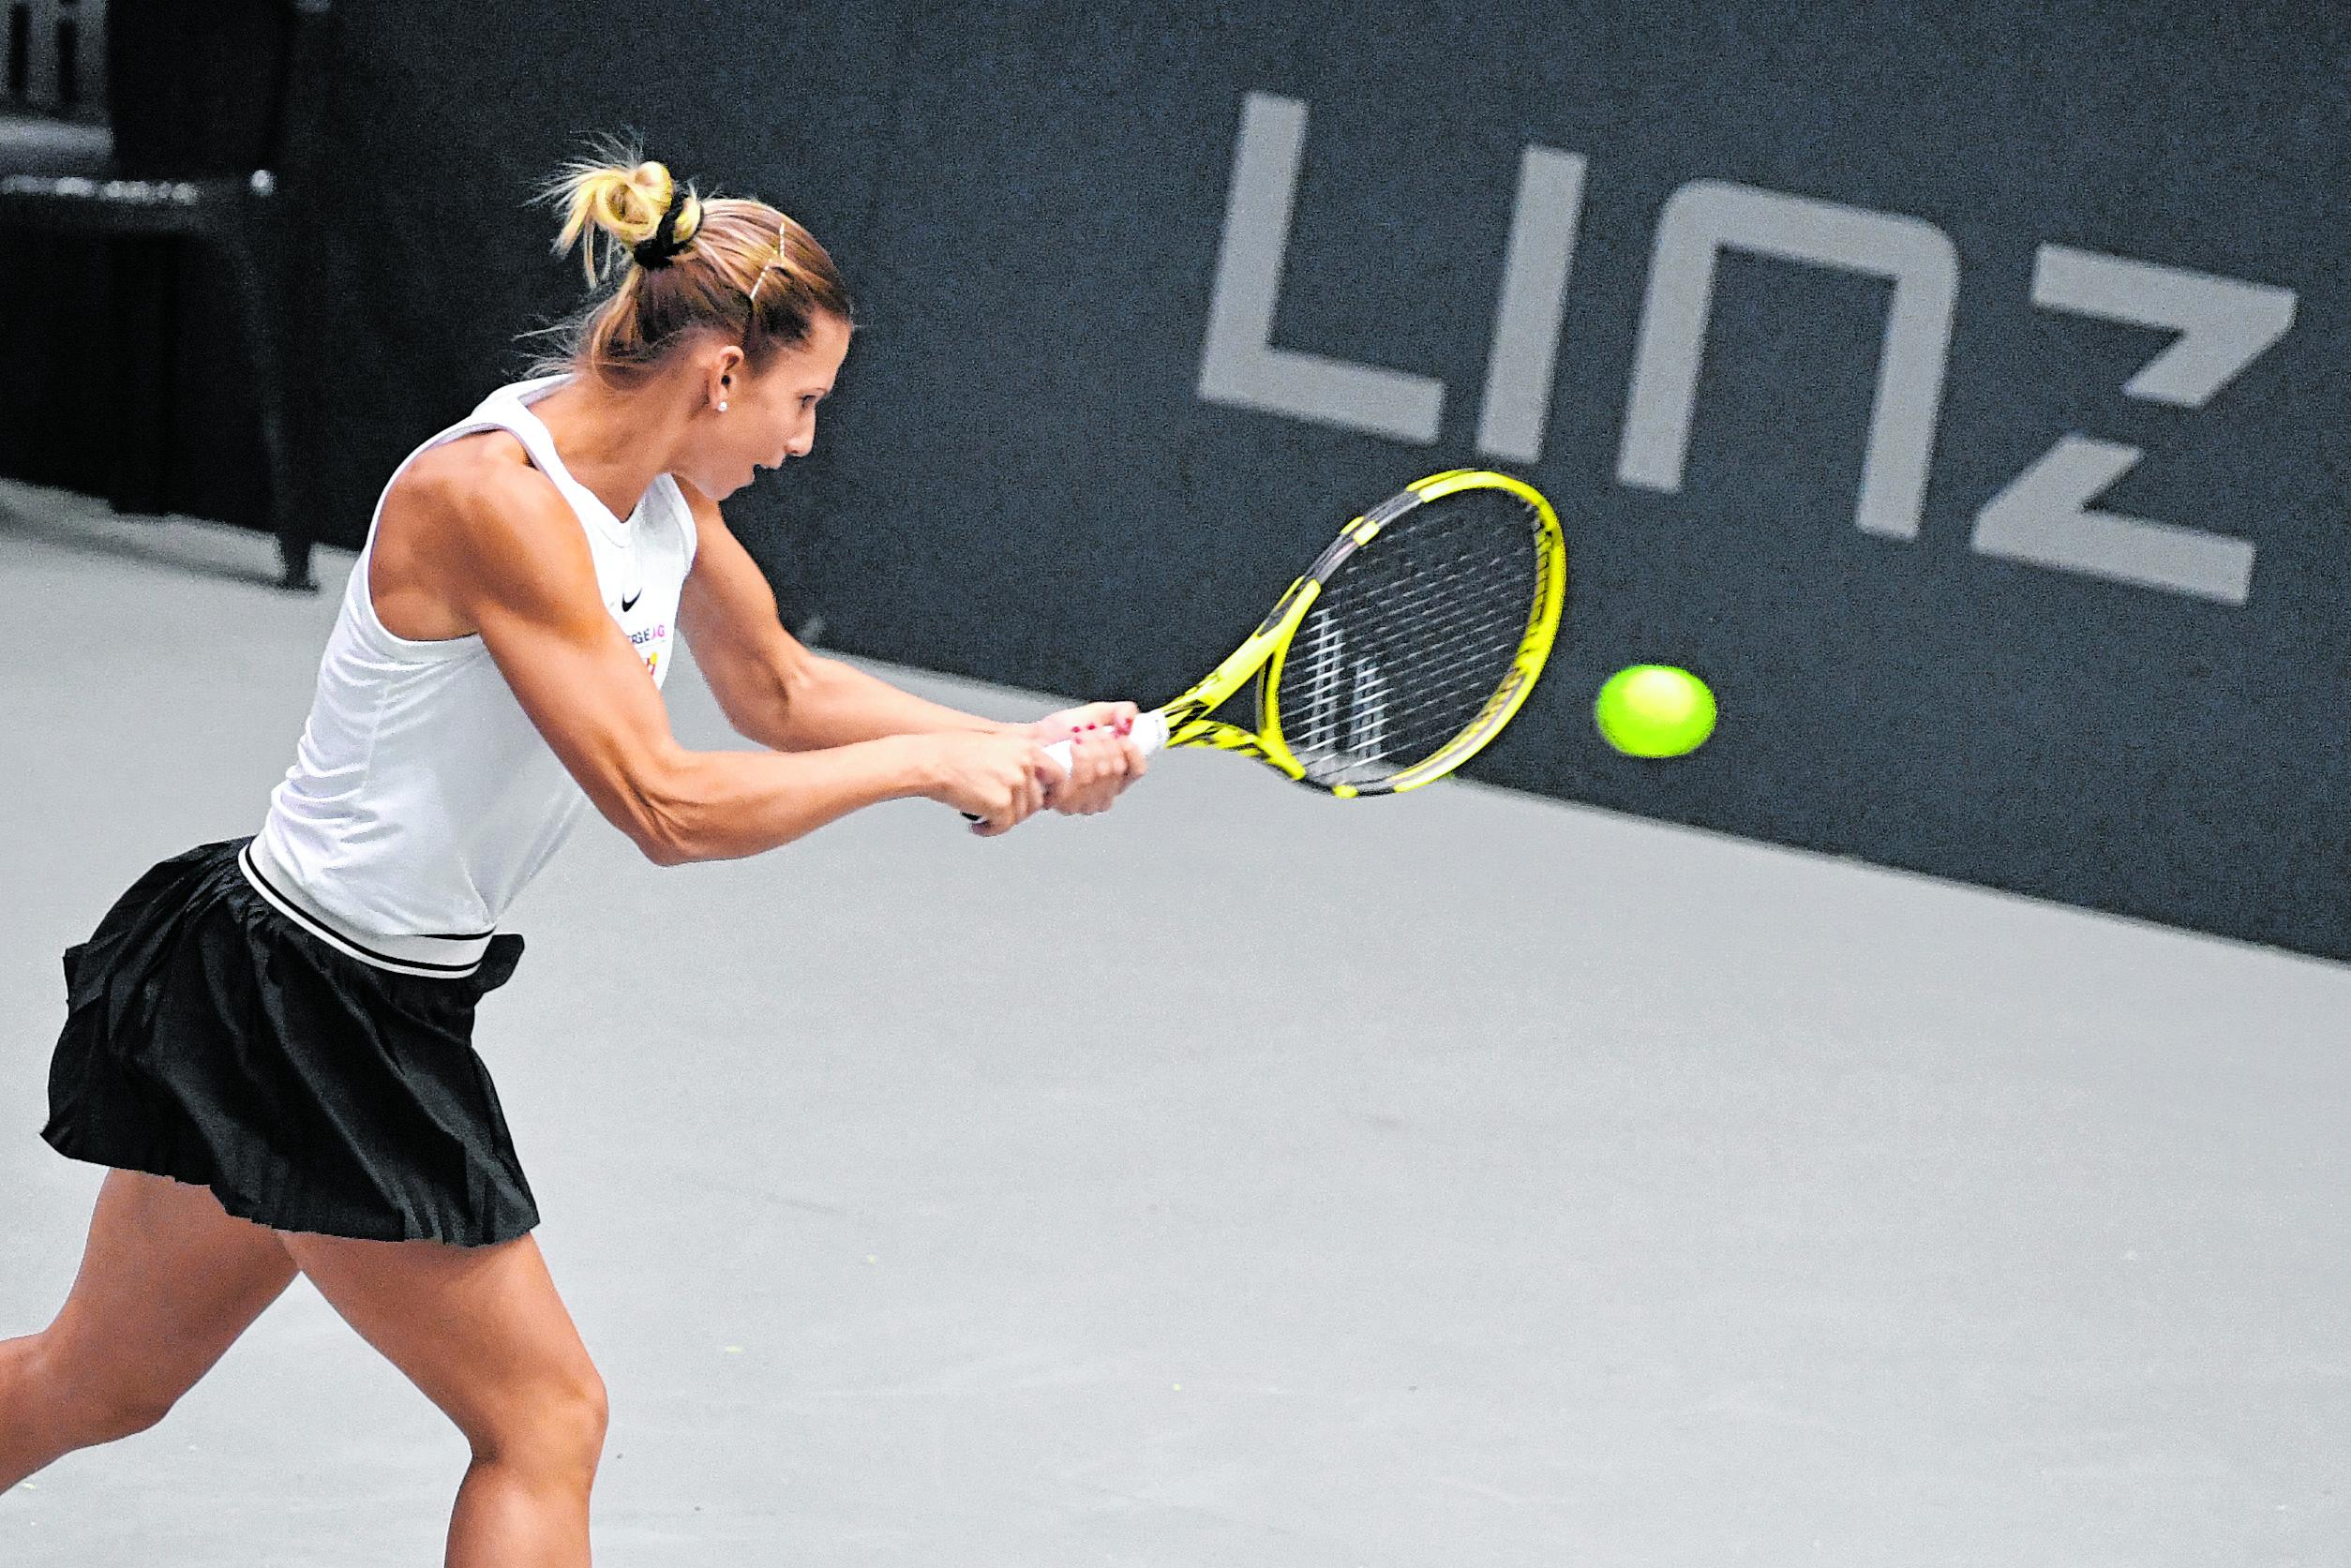 Lokalmatadorin Haas erhielt erneut Wildcard für Linz-Turnier